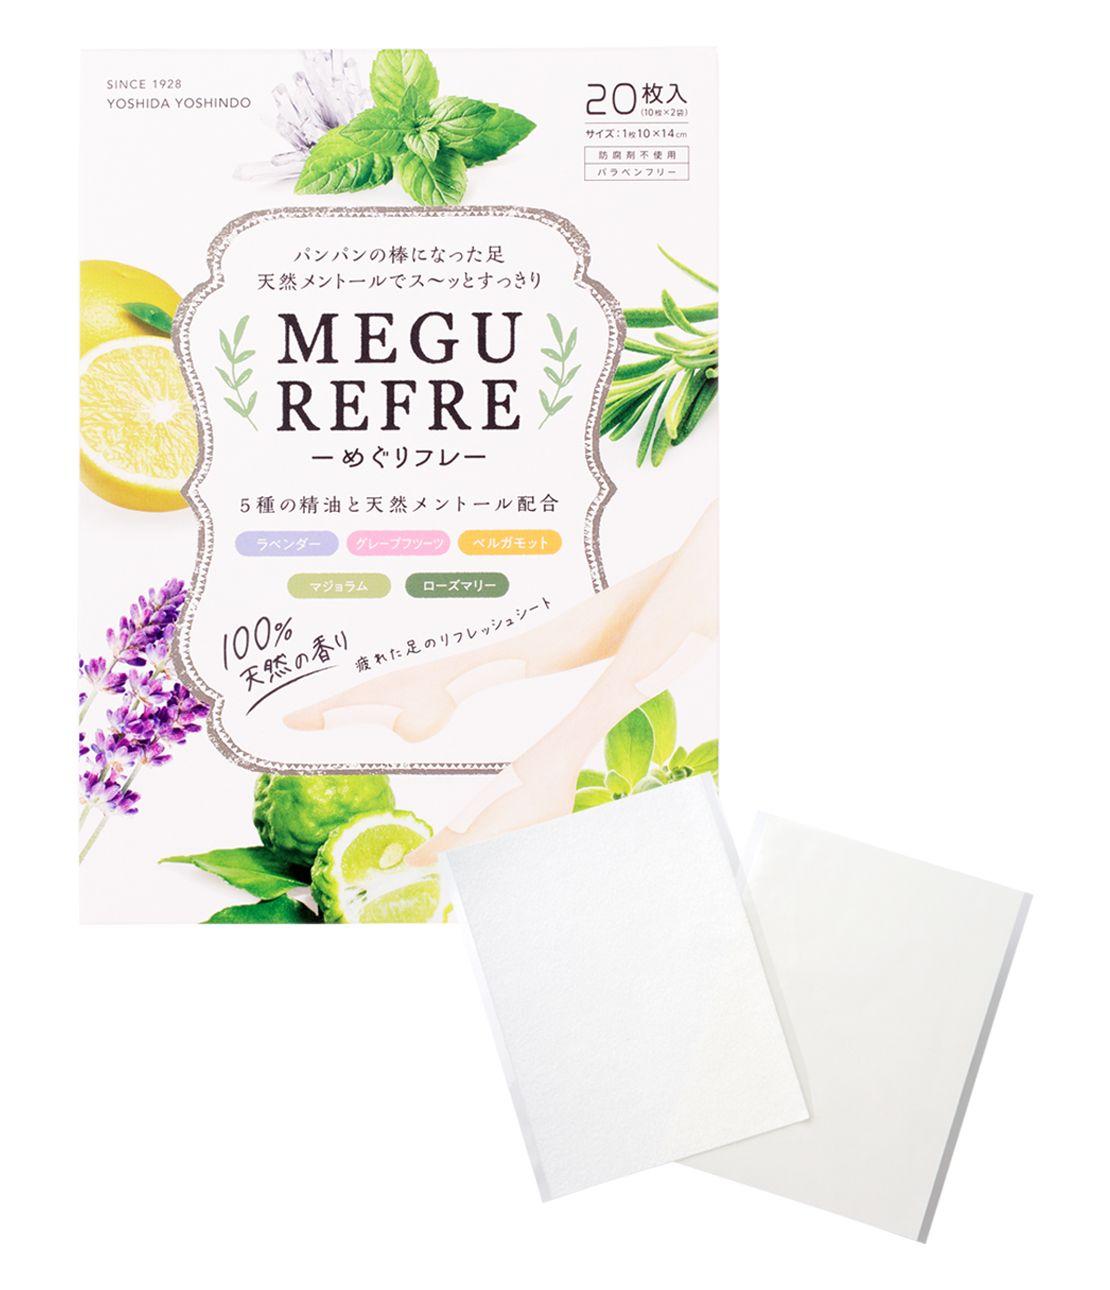 Megu reflation